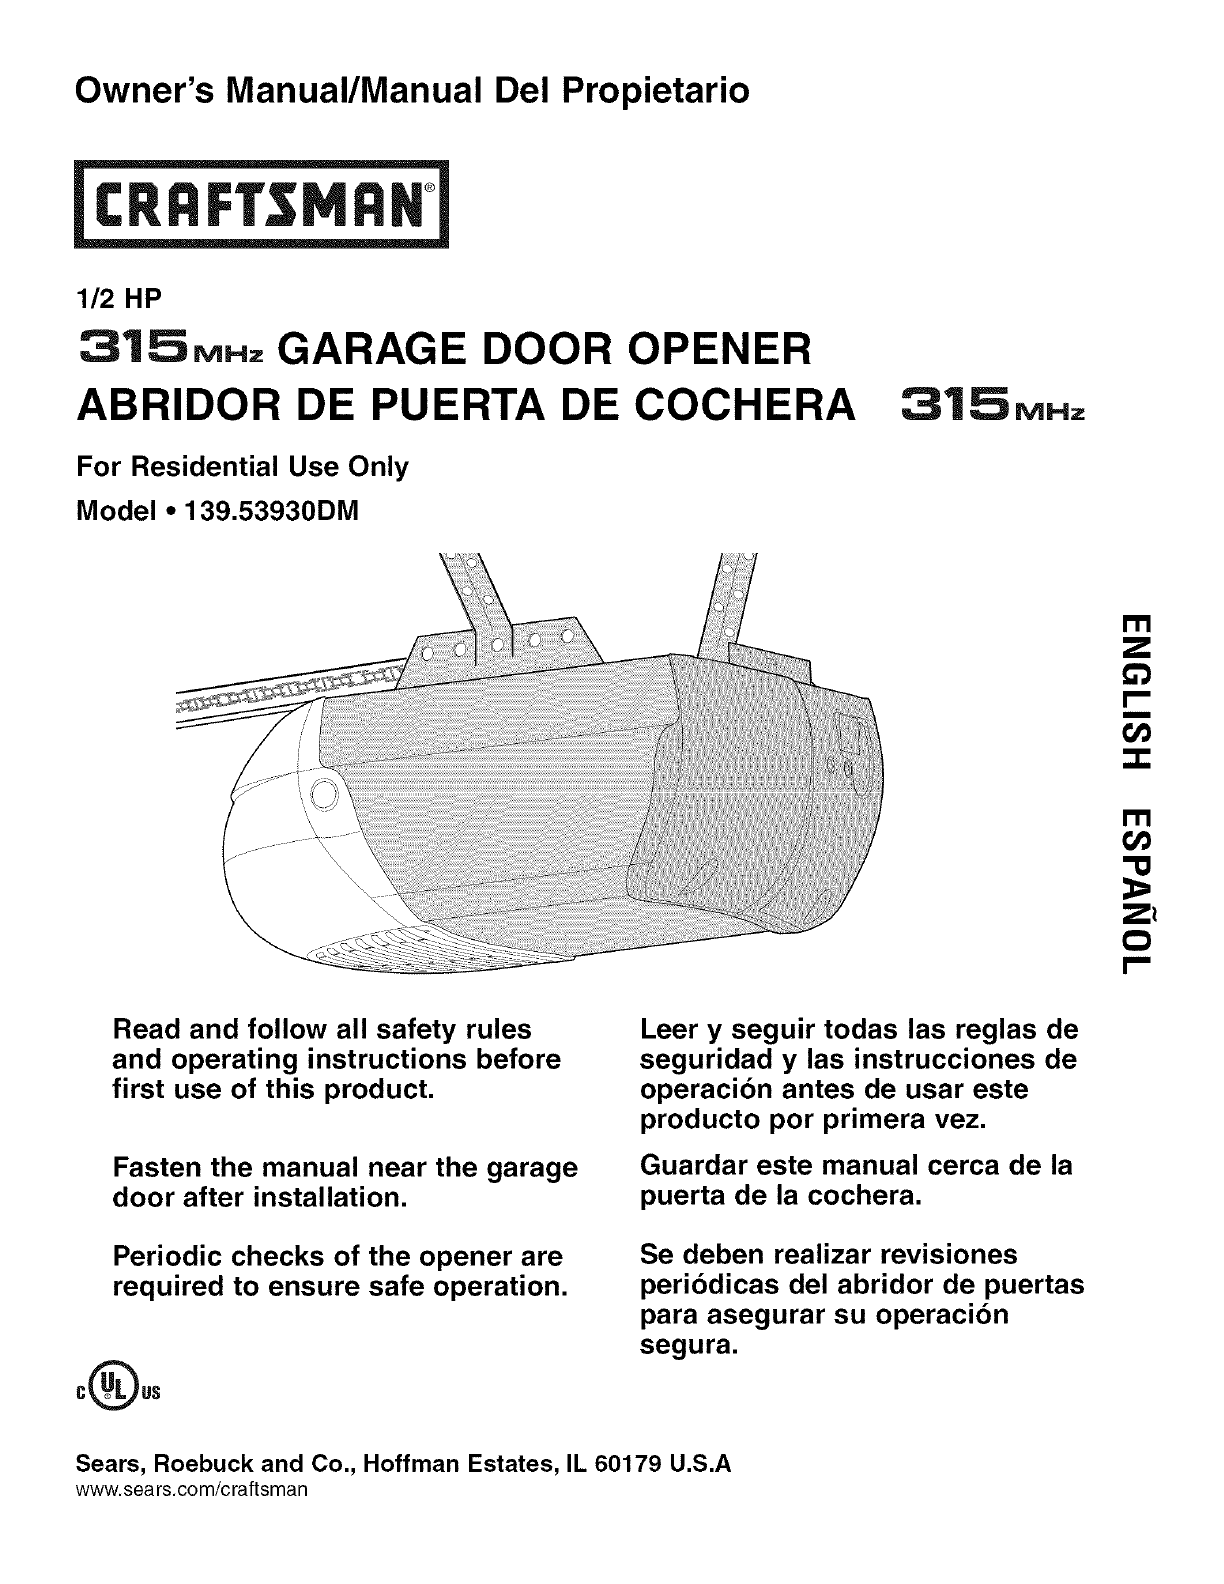 Craftsman 13953930dm User Manual Garage Door Opener Manuals And Wiring Diagram Guides L0803740